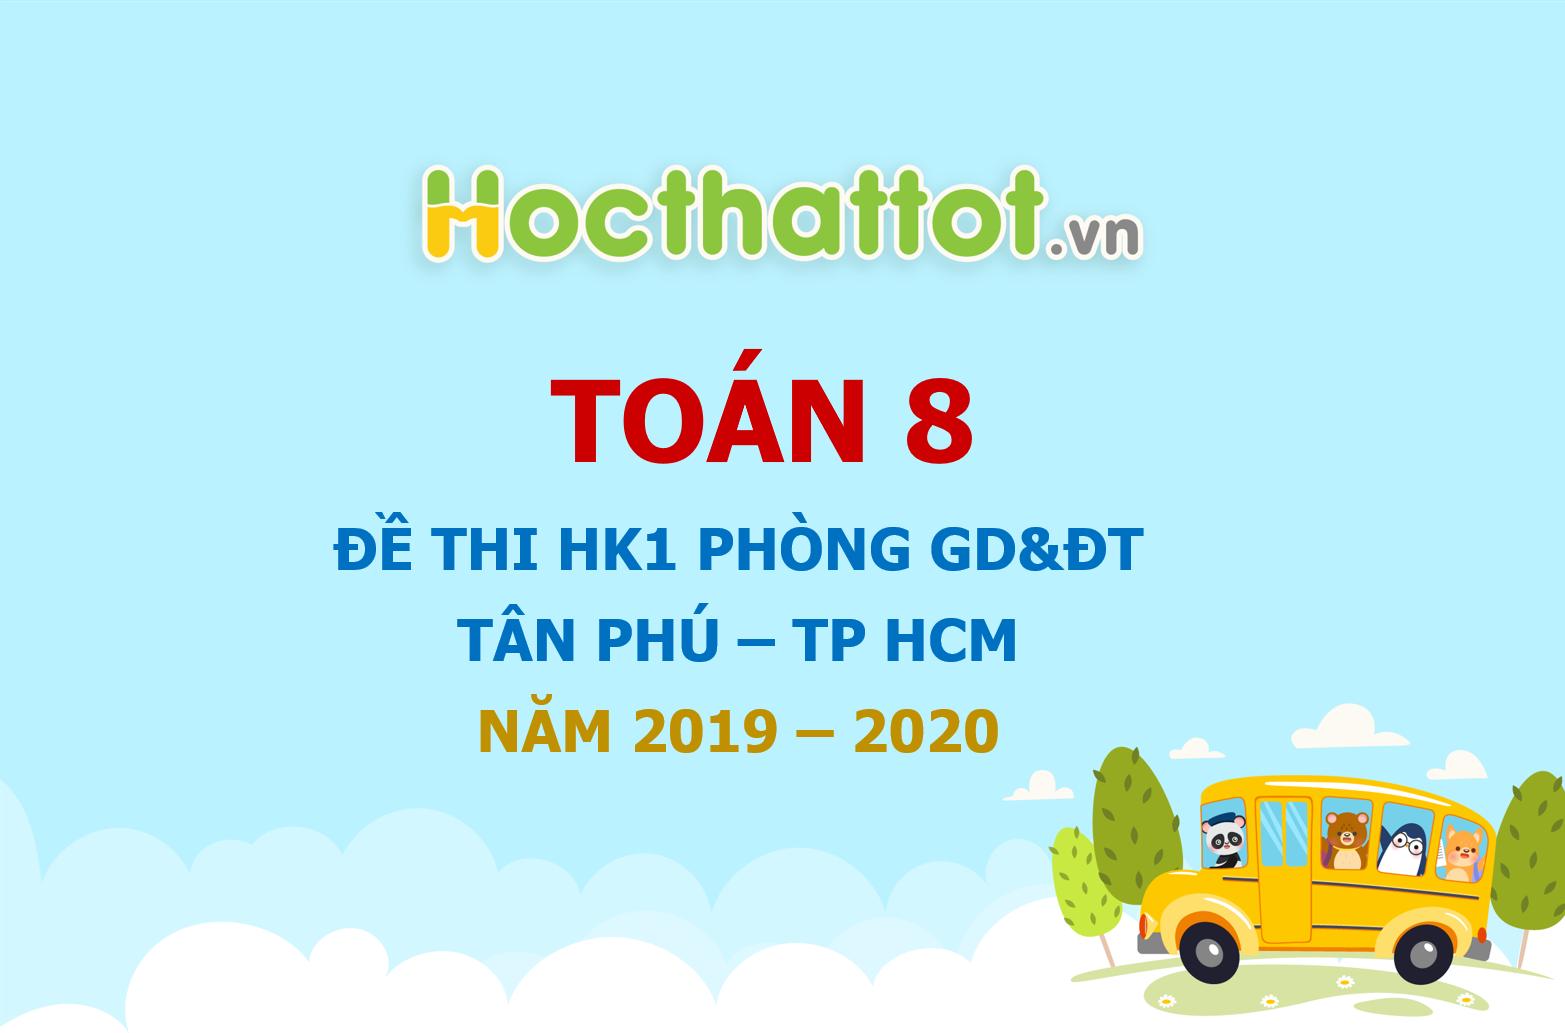 de-thi-hk1-toan-8-nam-hoc-2019-2020-phong-gddt-tan-phu-tp-hcm